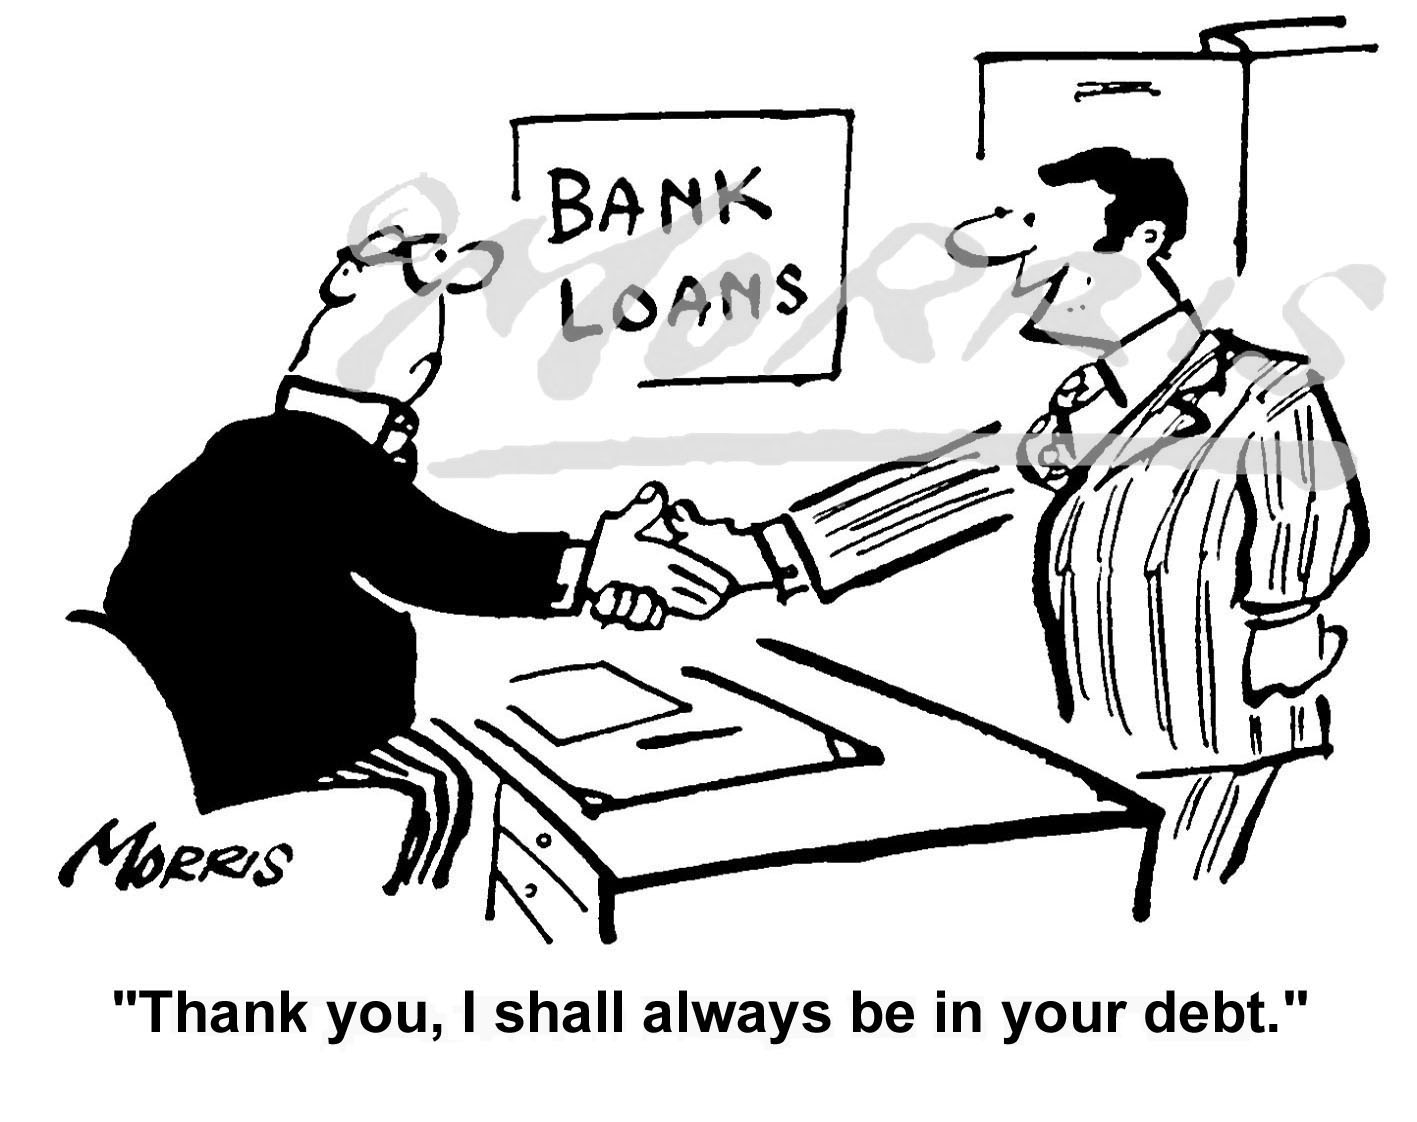 Bank loans cartoon – Ref: 0270bw